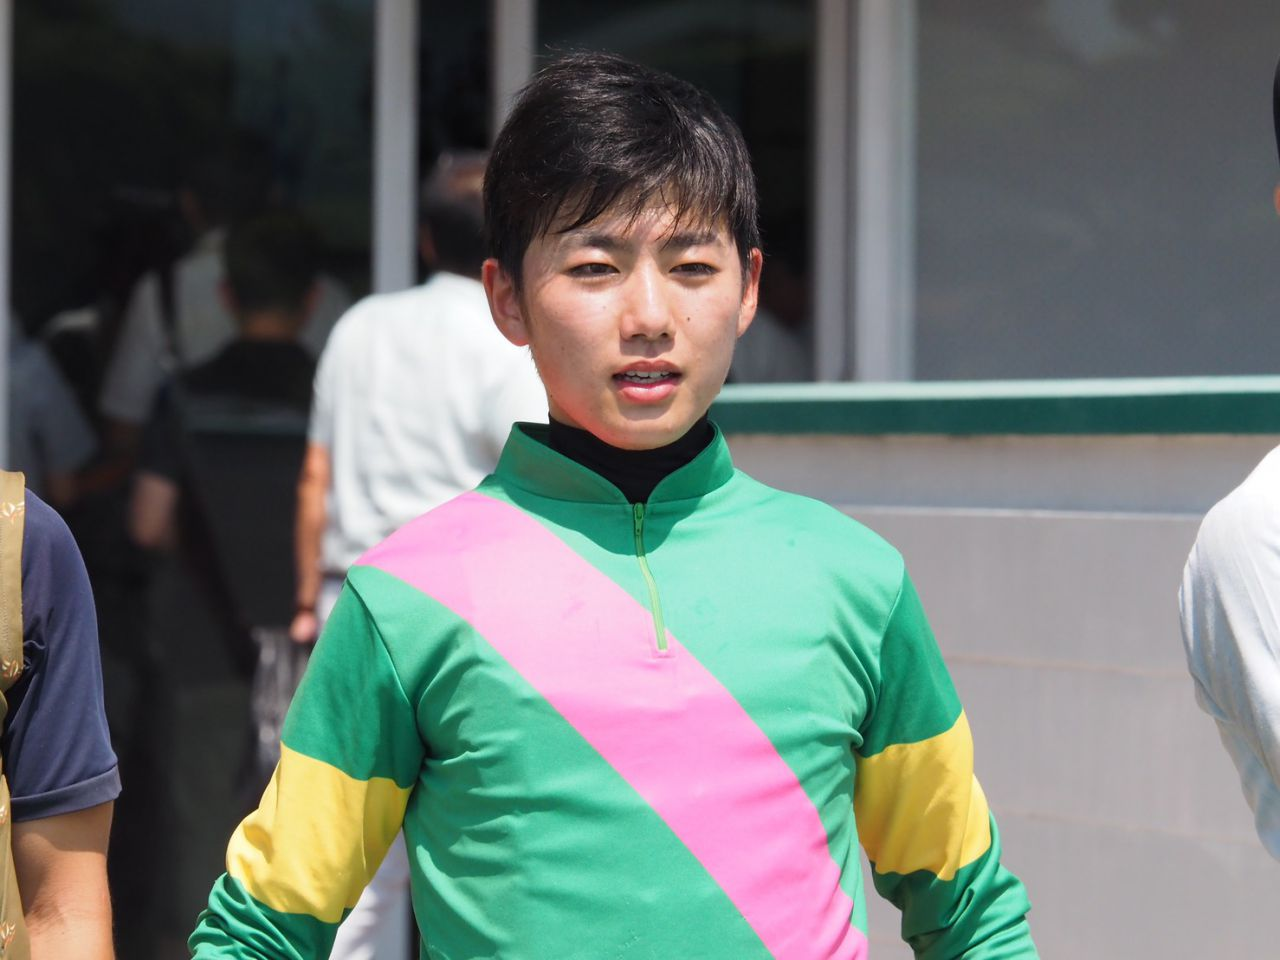 2019年度「中央競馬関西放送記者クラブ賞」は斎藤新騎手、岩田望来騎手が受賞